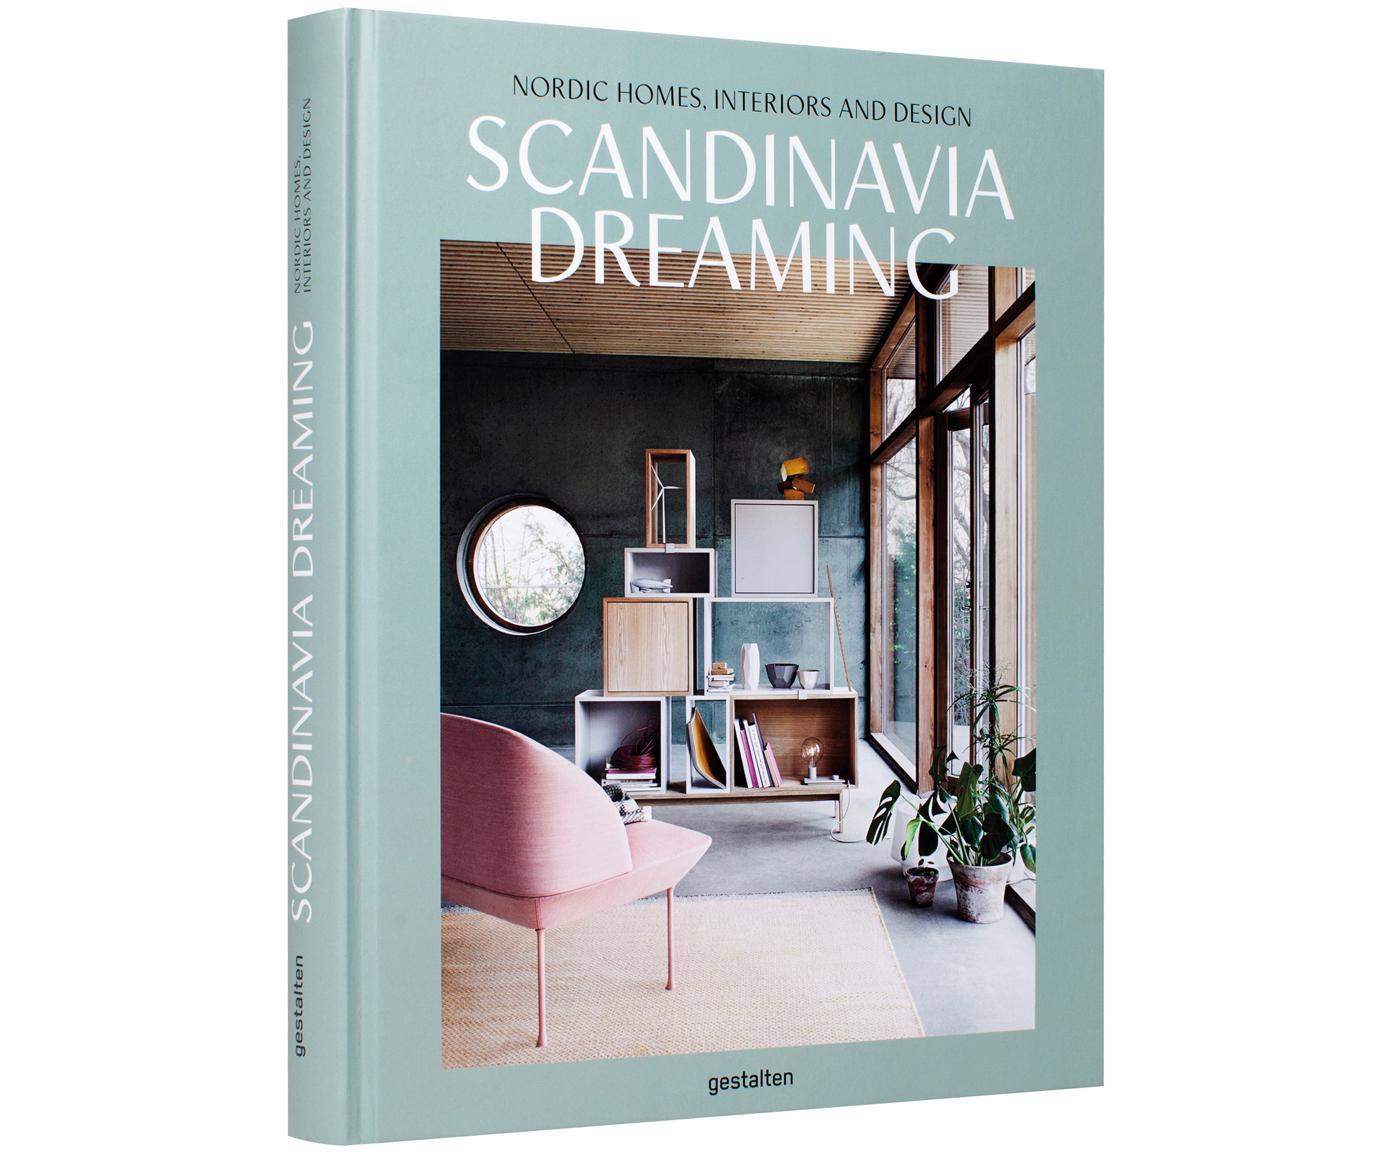 Geïllustreerd boek Scandinavia Dreaming, Papier, hardcover, Multicolour, 24 x 30 cm